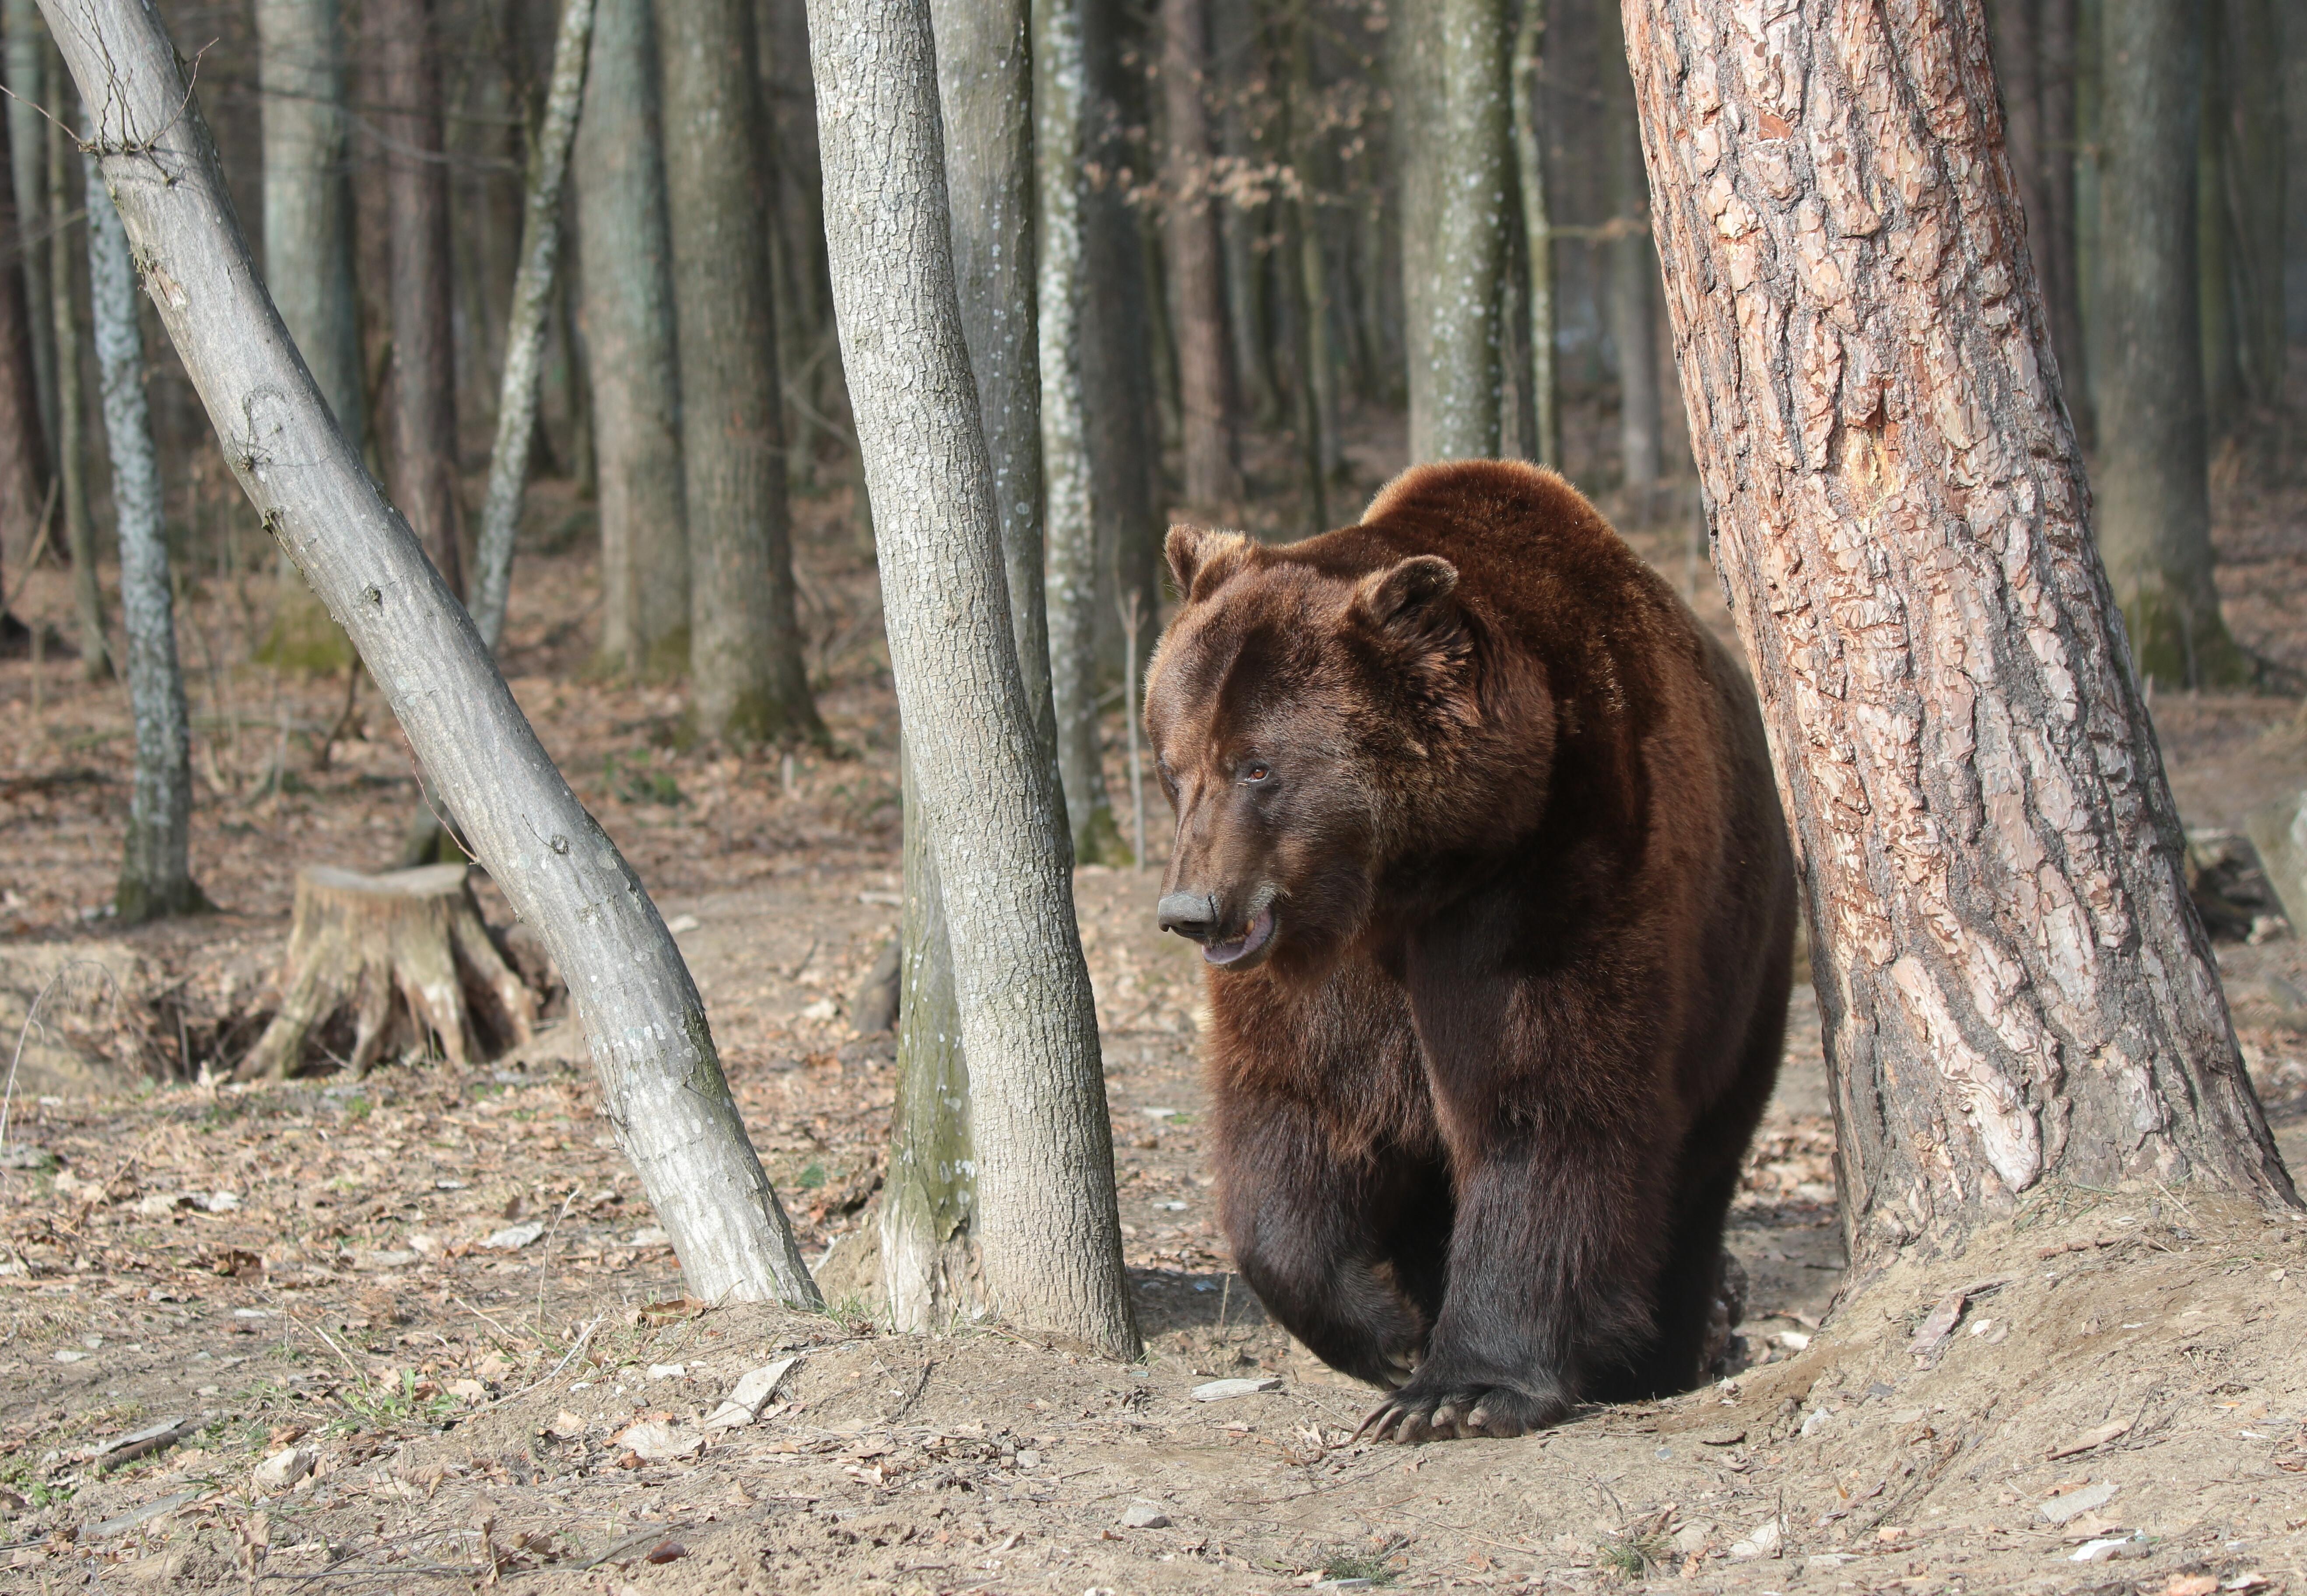 Bear Potap at BEAR SANCTUARY Domazhyr, Ukraine